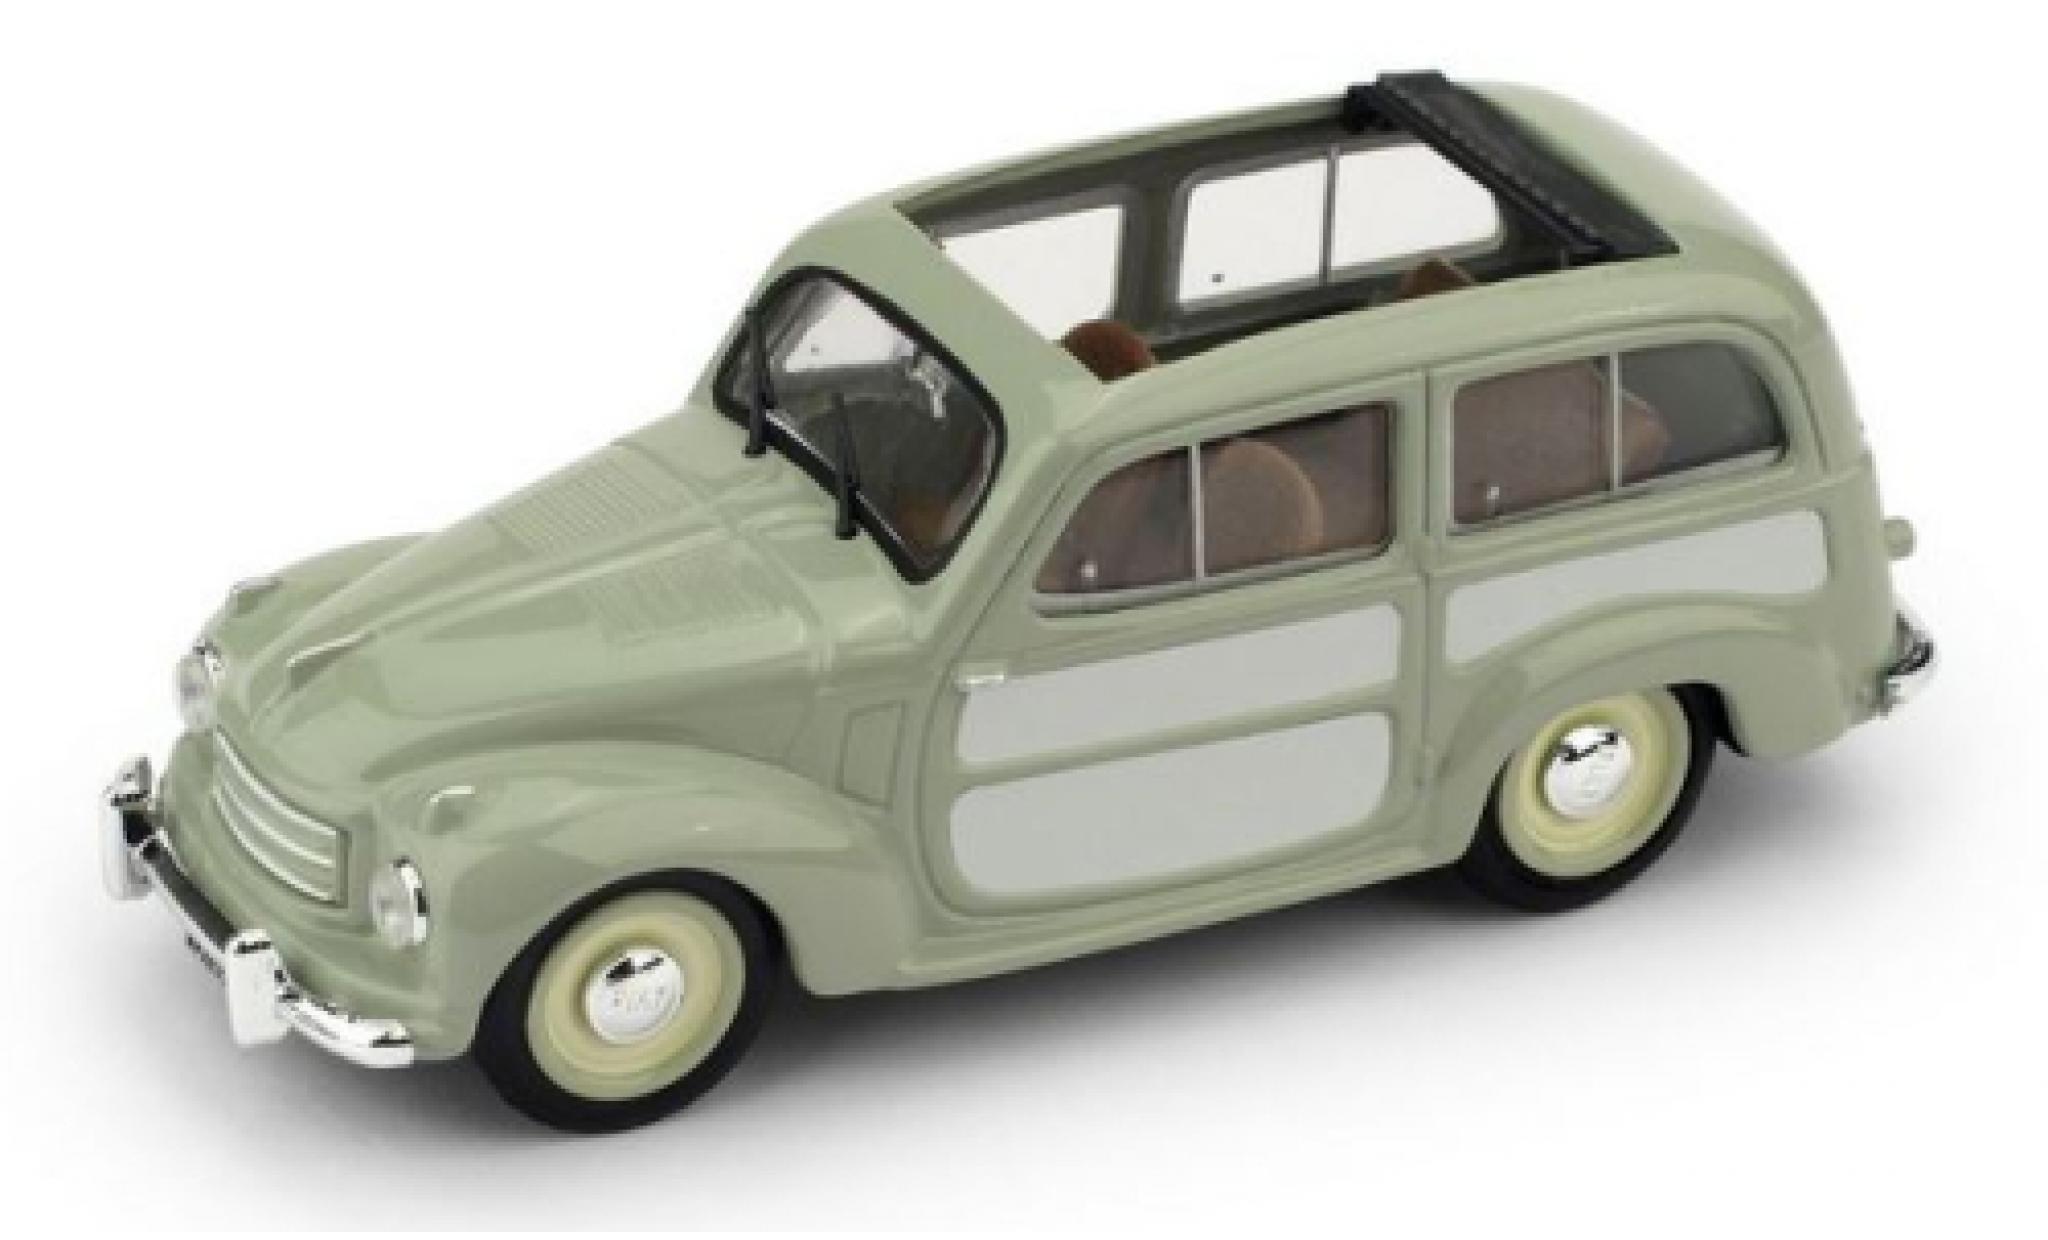 Fiat 500 1/43 Brumm C Belvedere green/grey 1951 toit rabattable ouvert